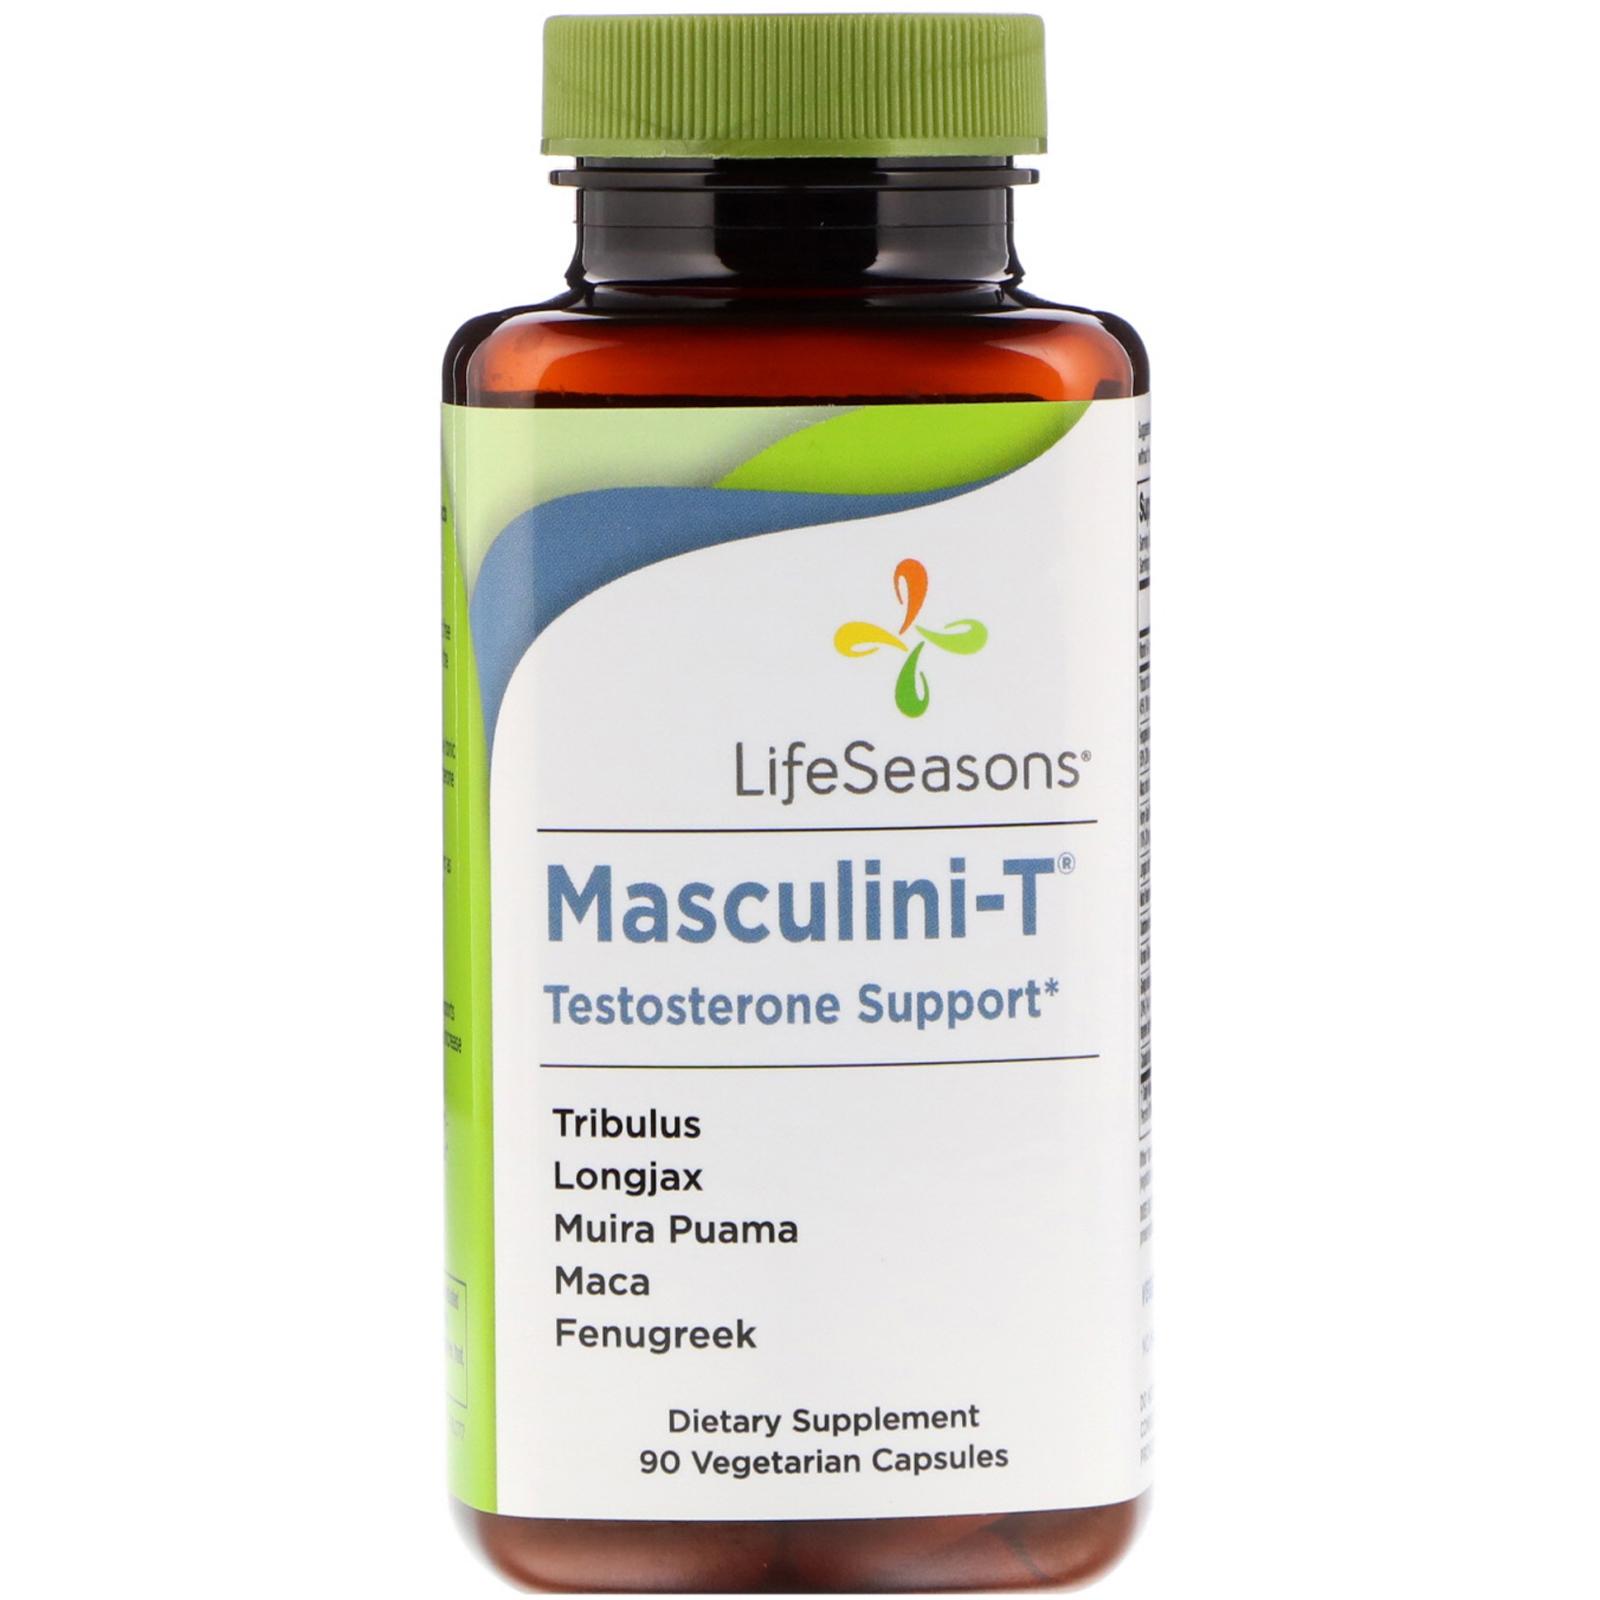 LifeSeasons, Masculini-T, Testosterone Support, 90 Vegetarian Capsules